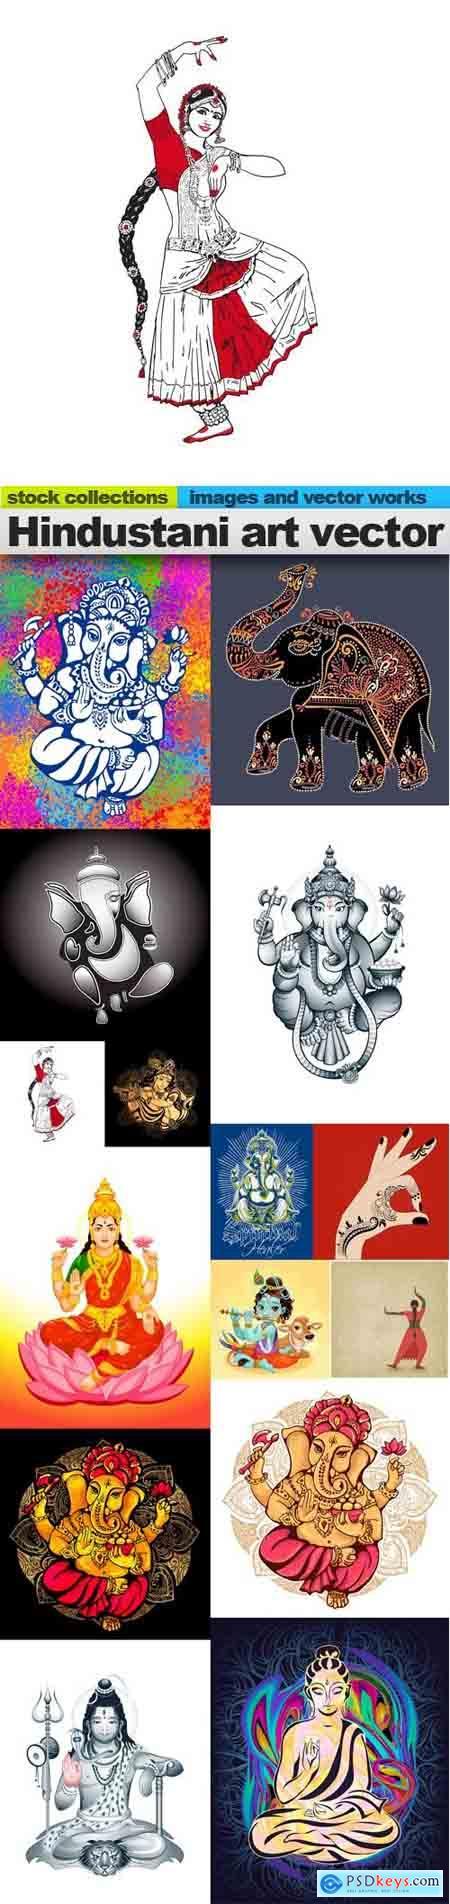 Hindustani art vector, 15 x EPS